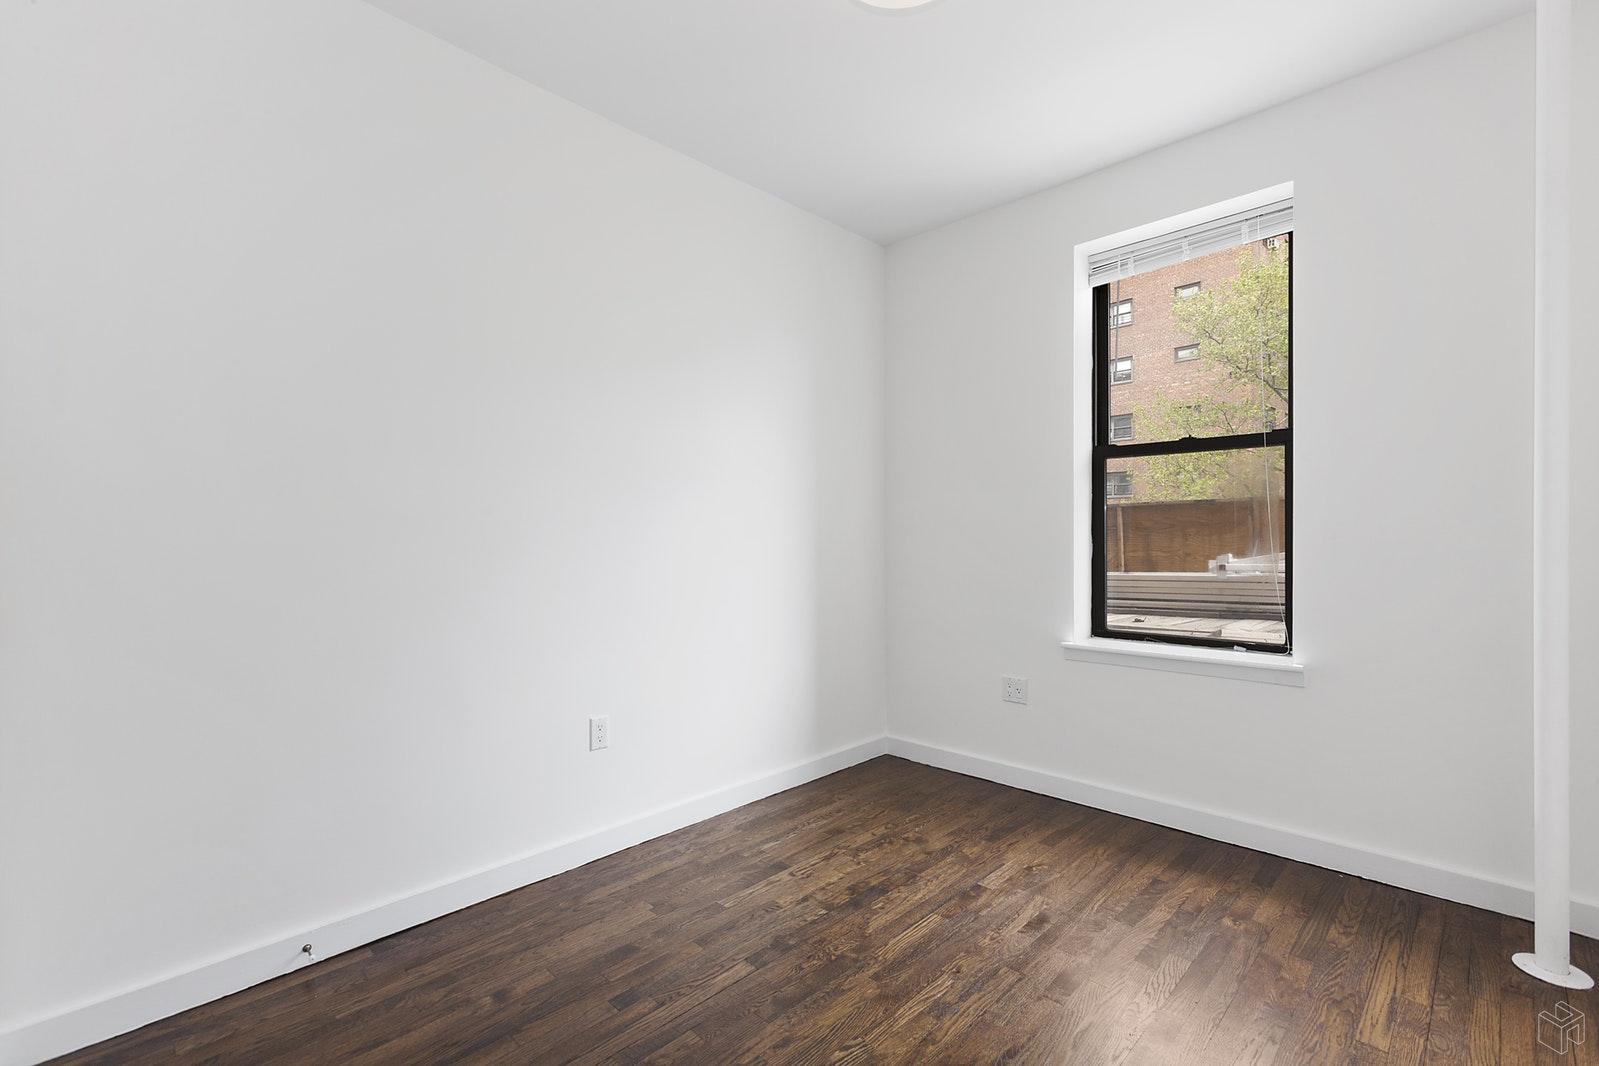 560 WEST 126TH STREET 556/23, Harlem, $3,650, Web #: 19205800